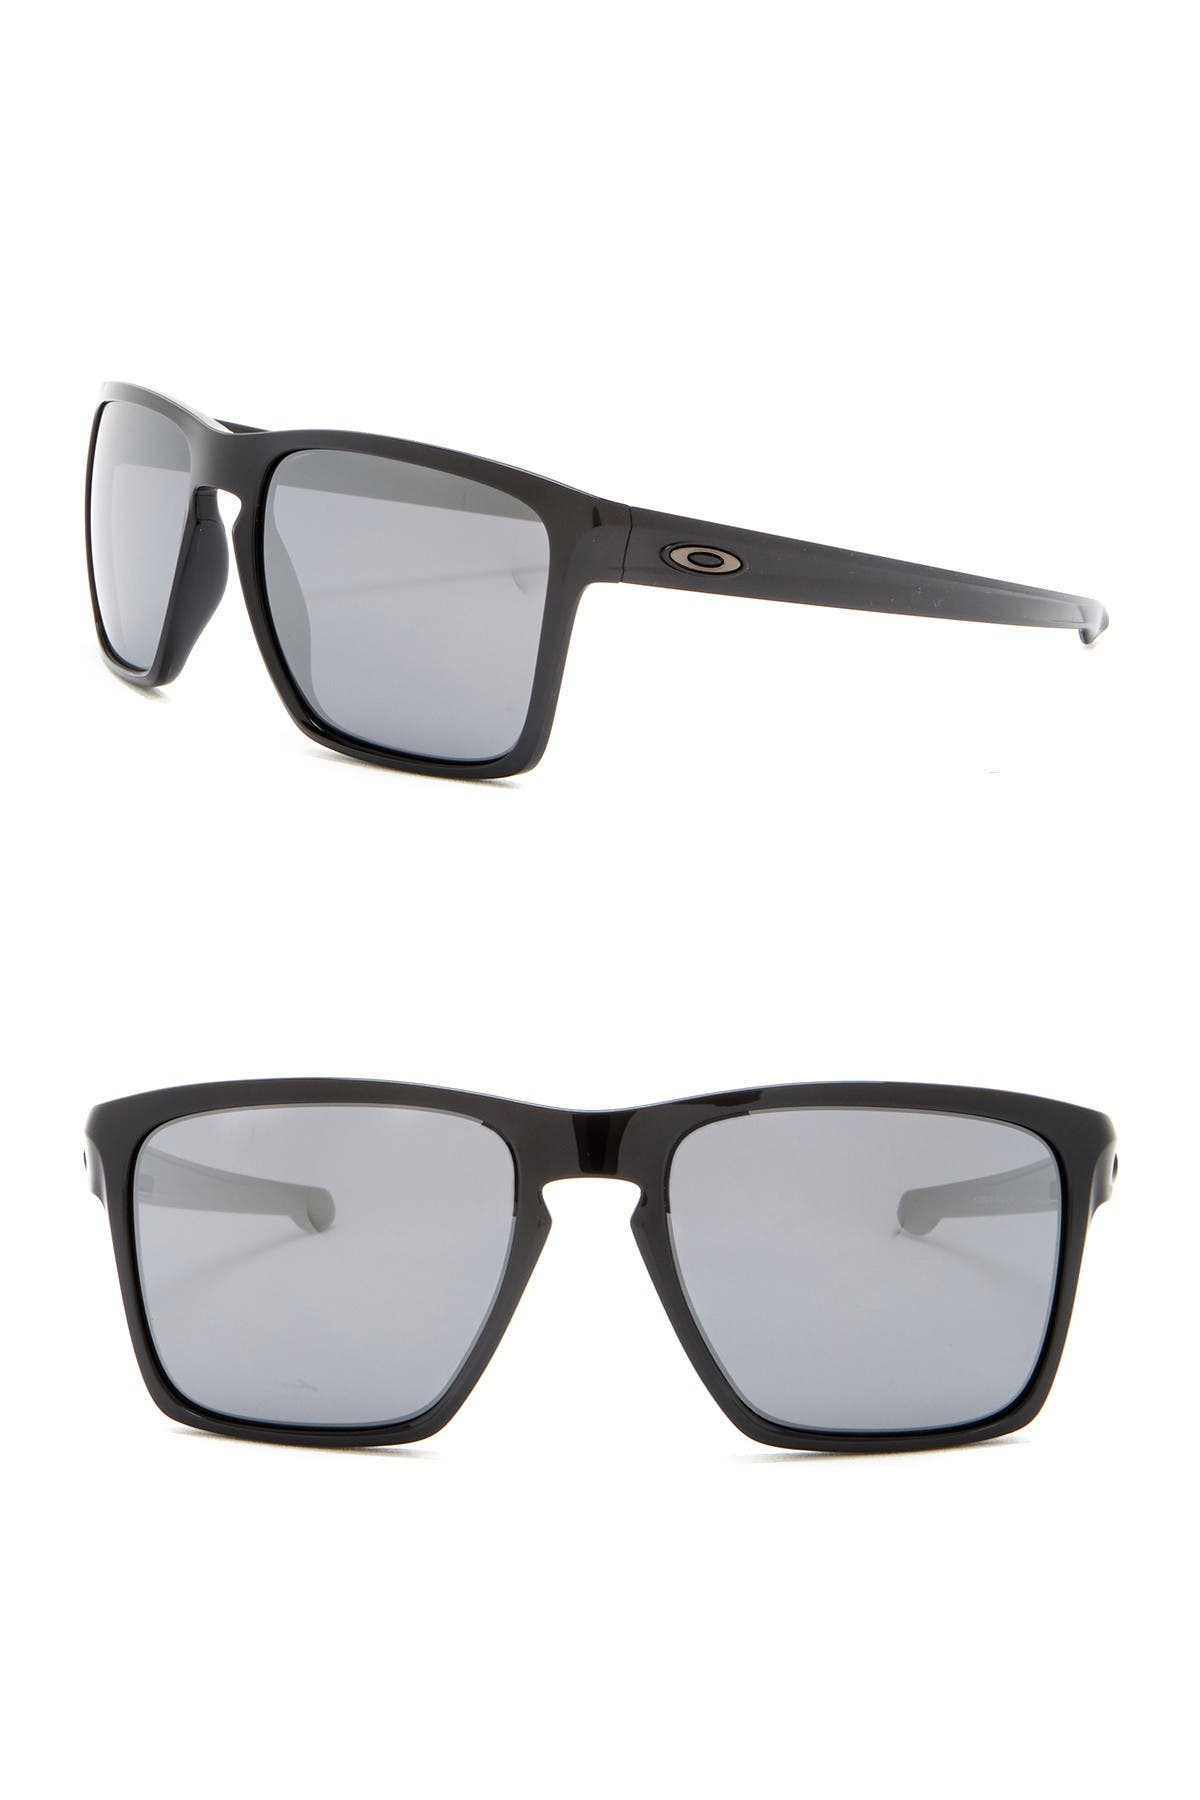 Image of Oakley 57mm Square Sunglasses